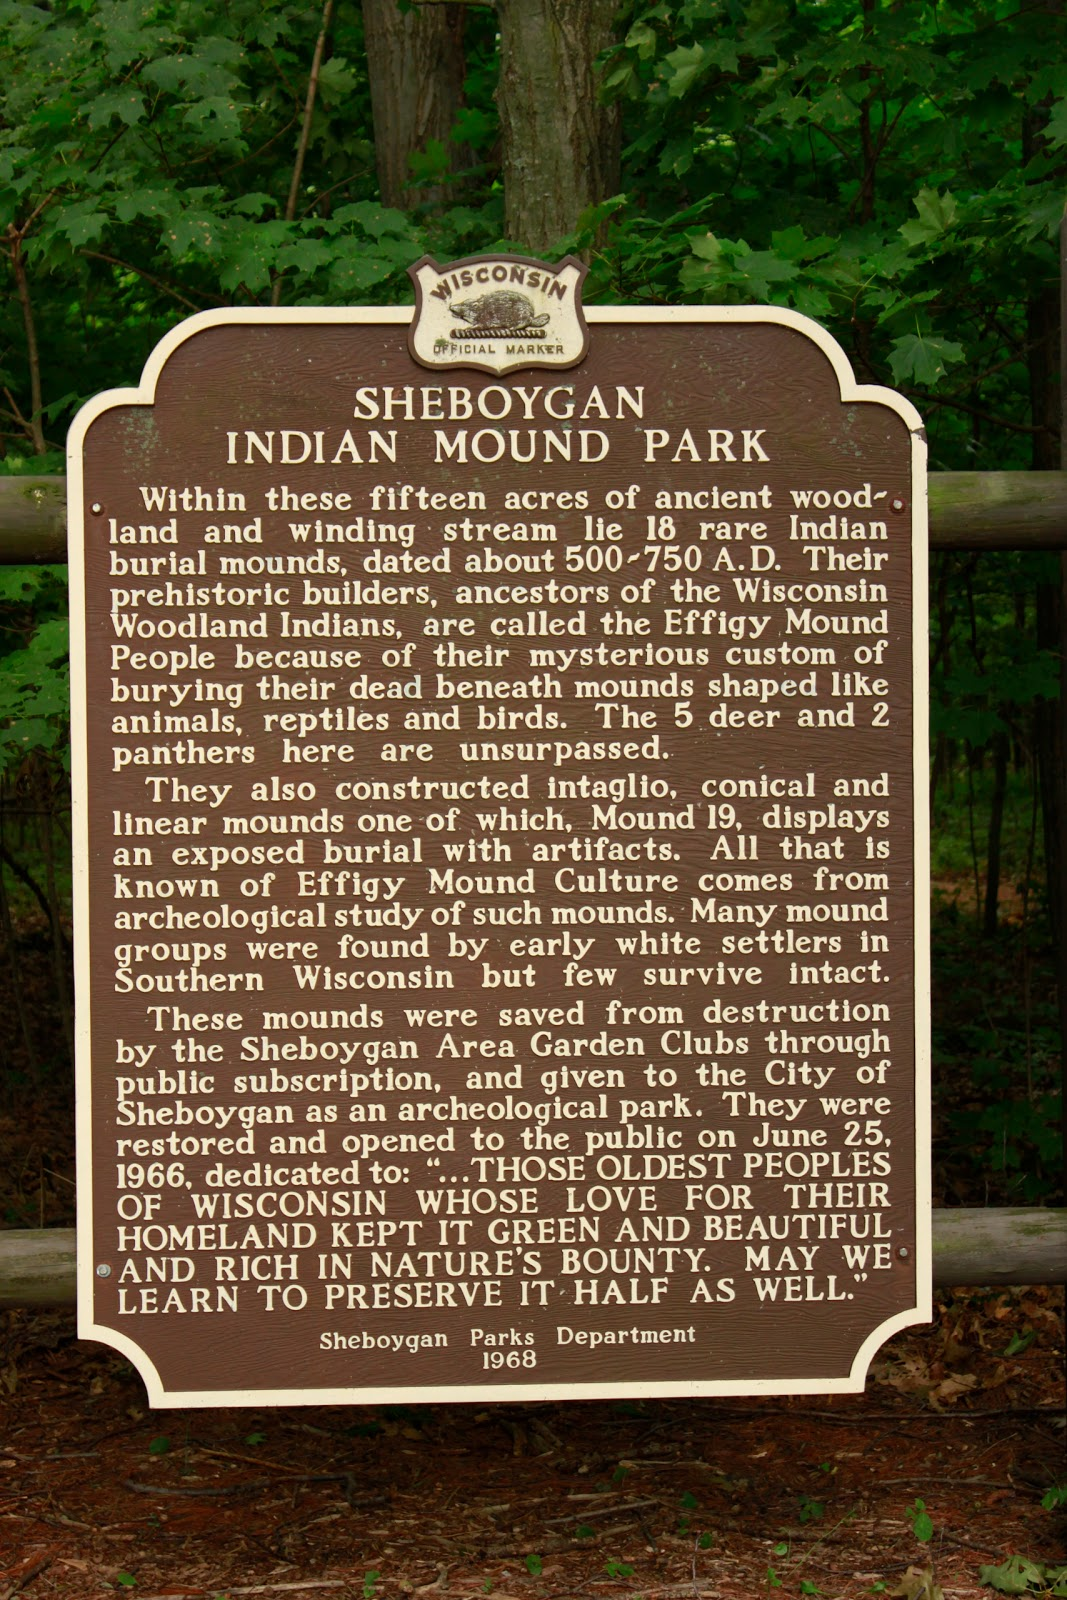 Wisconsin Historical Markers: Marker 163: Sheboygan Indian